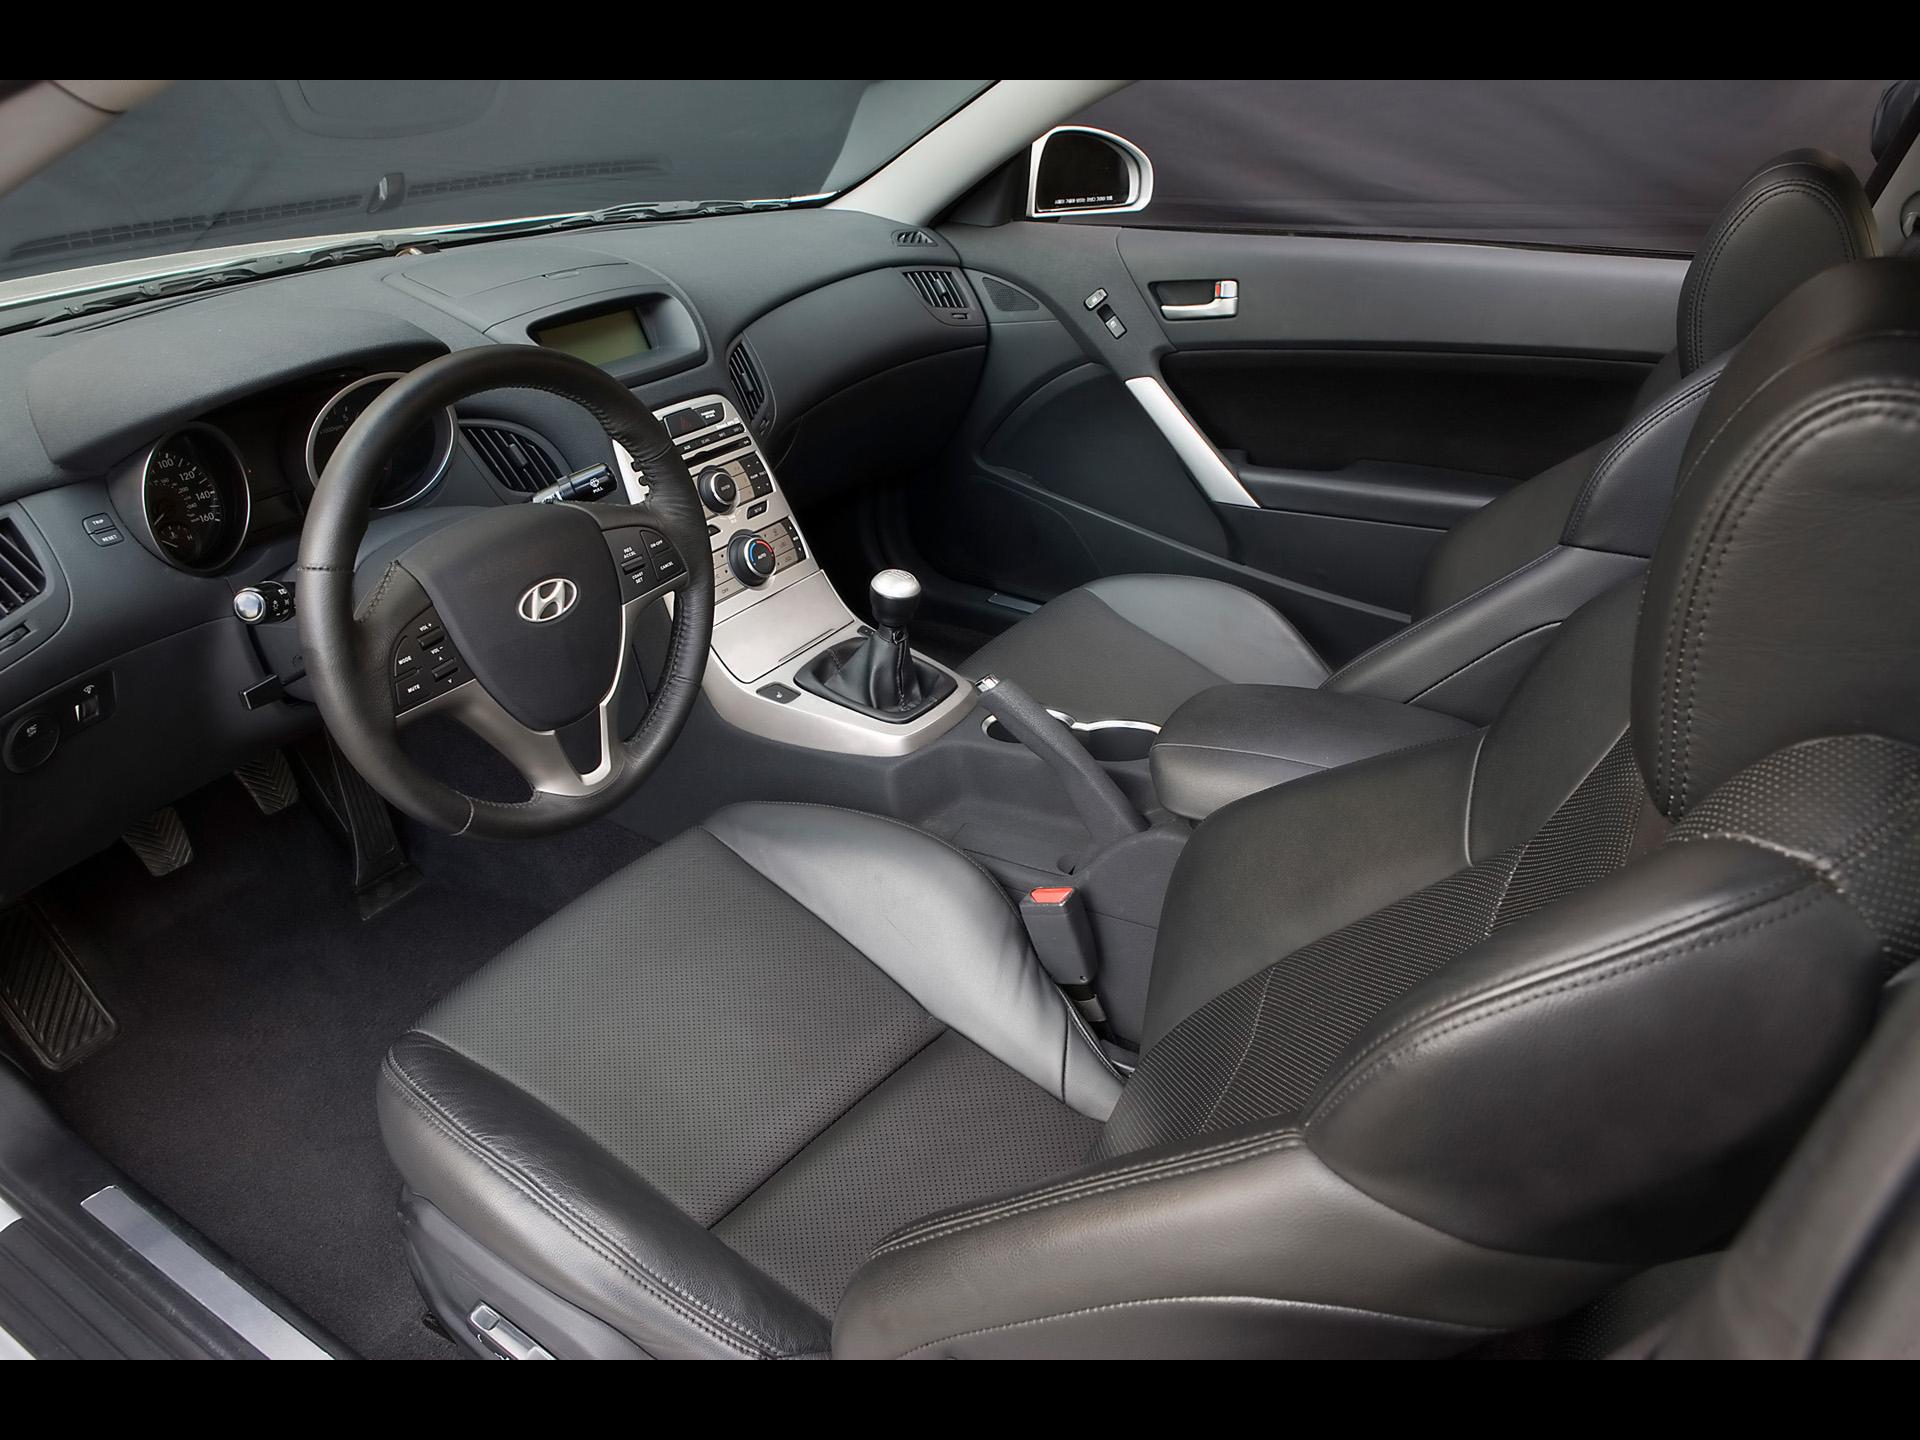 Interior Del Hyundai G 233 Nesis Coupe 2010 Lista De Carros